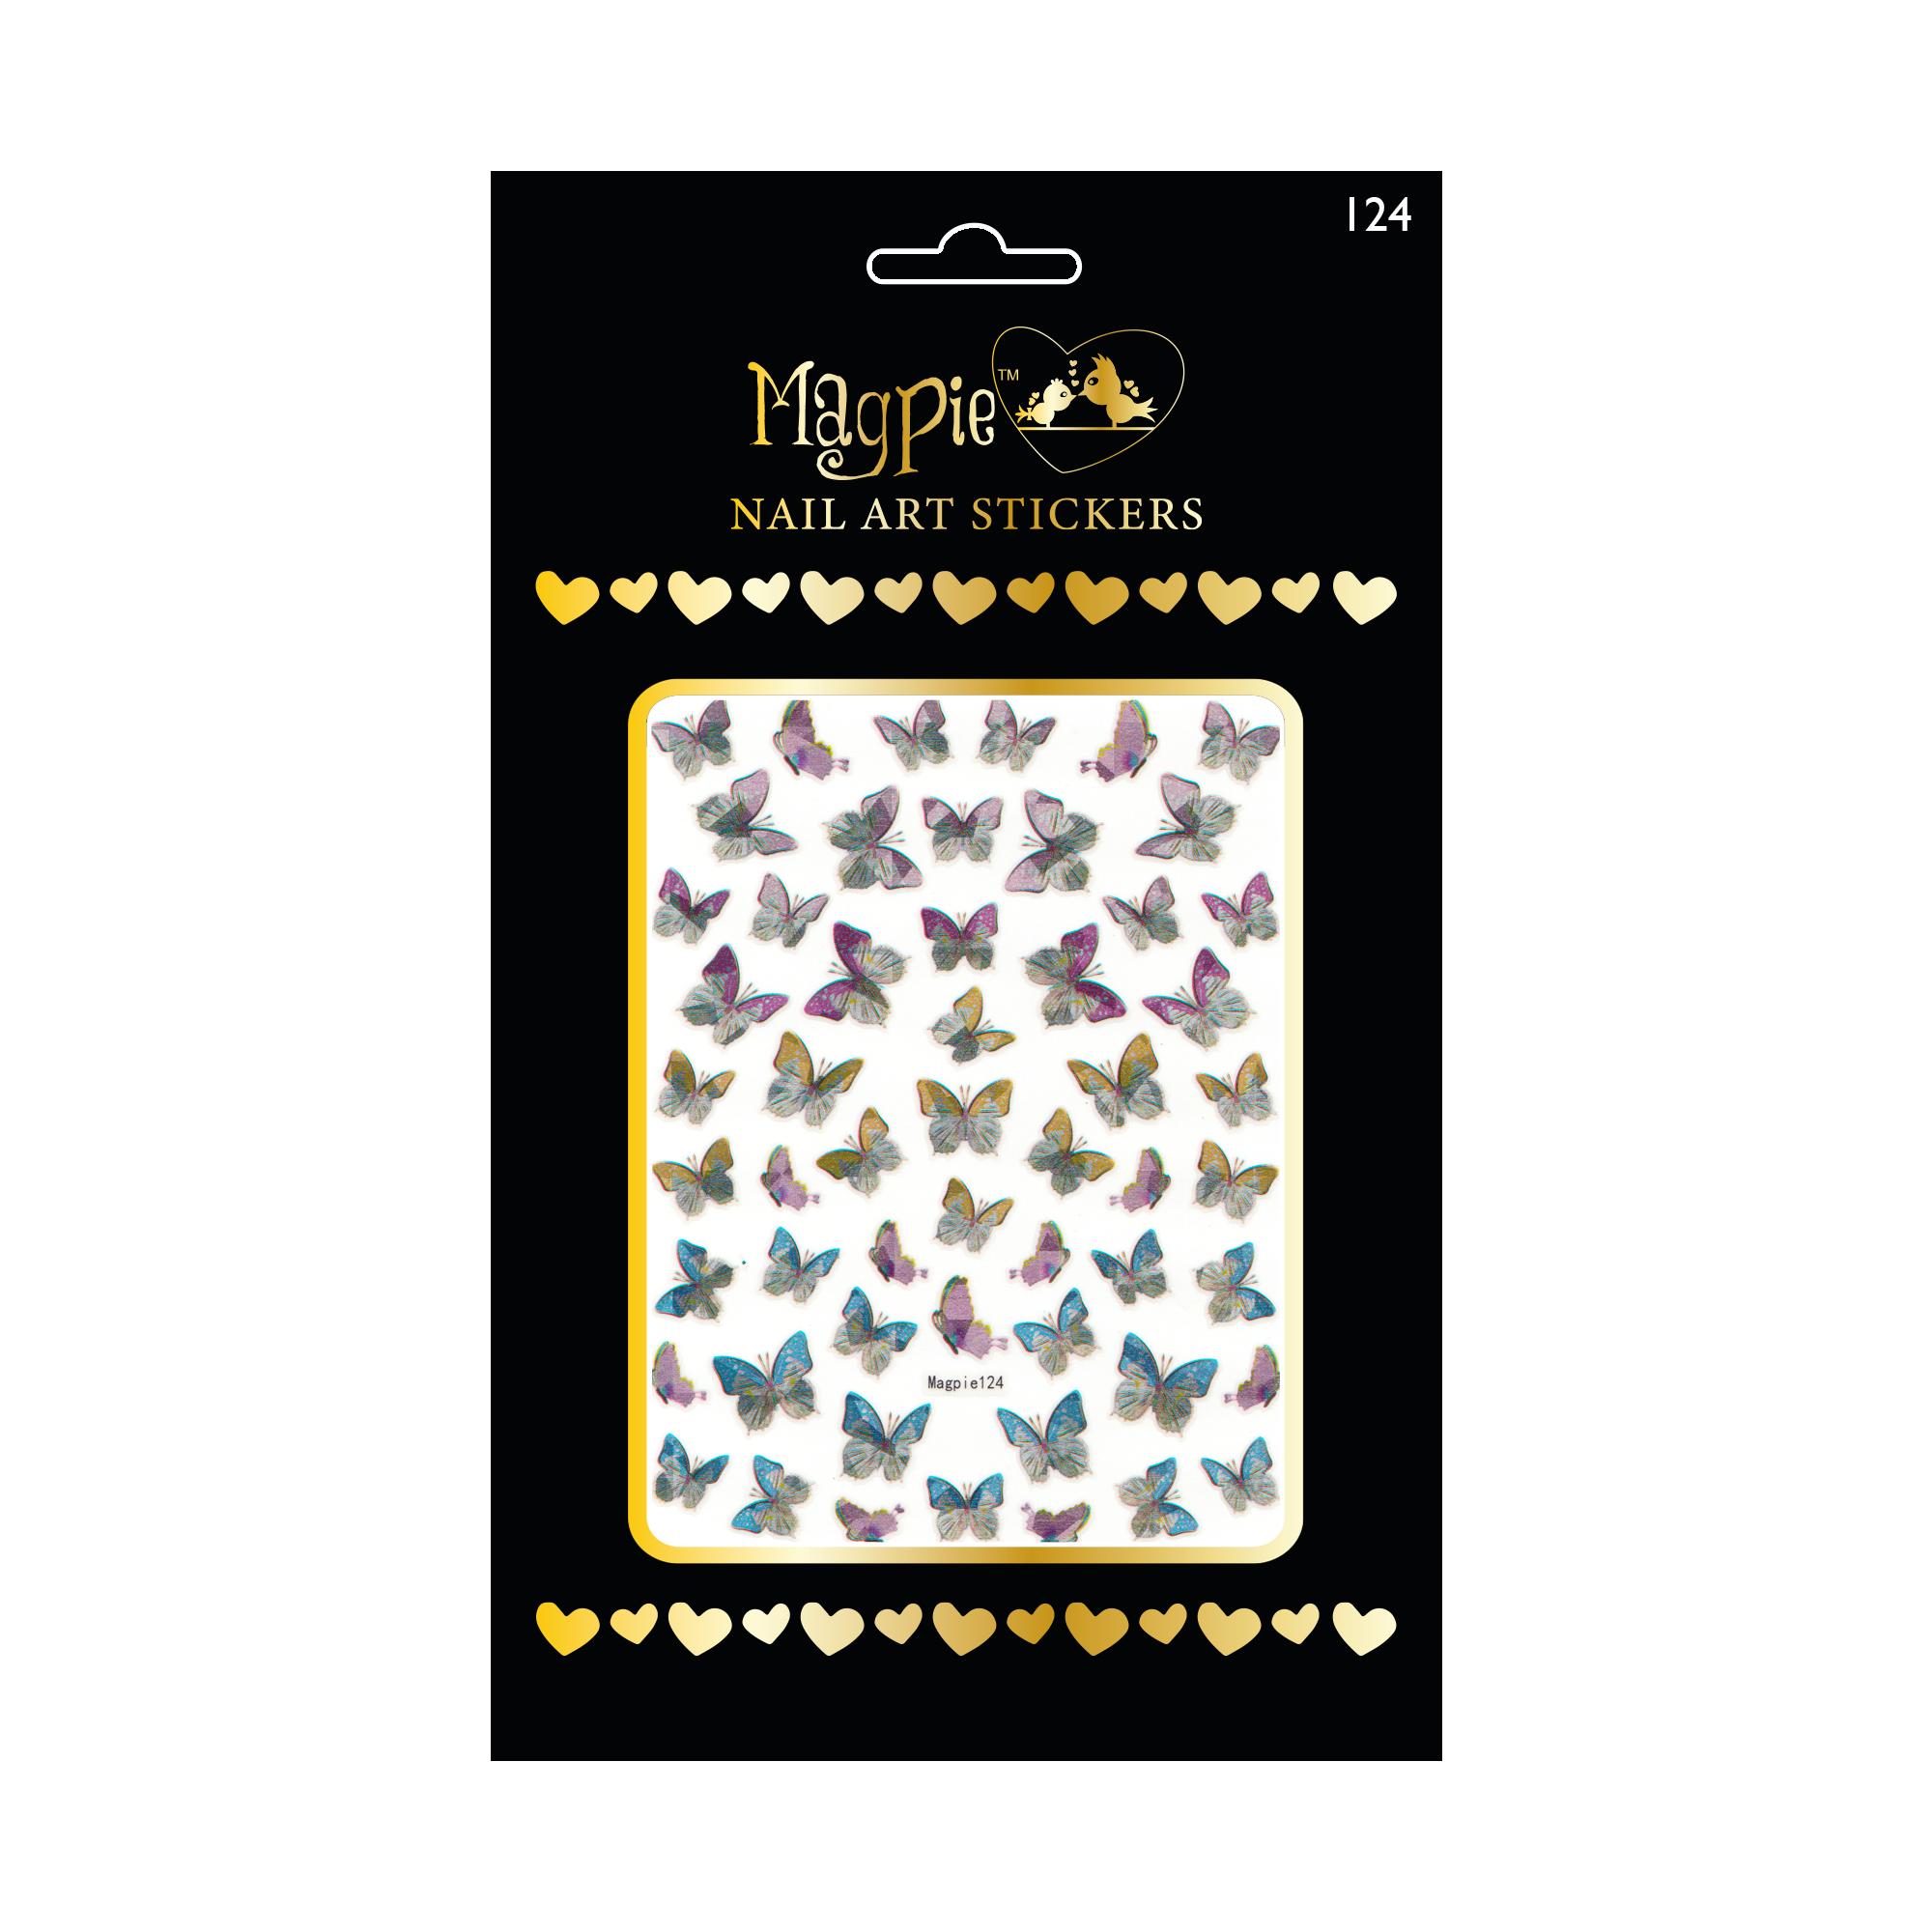 Magpie 124 stickers